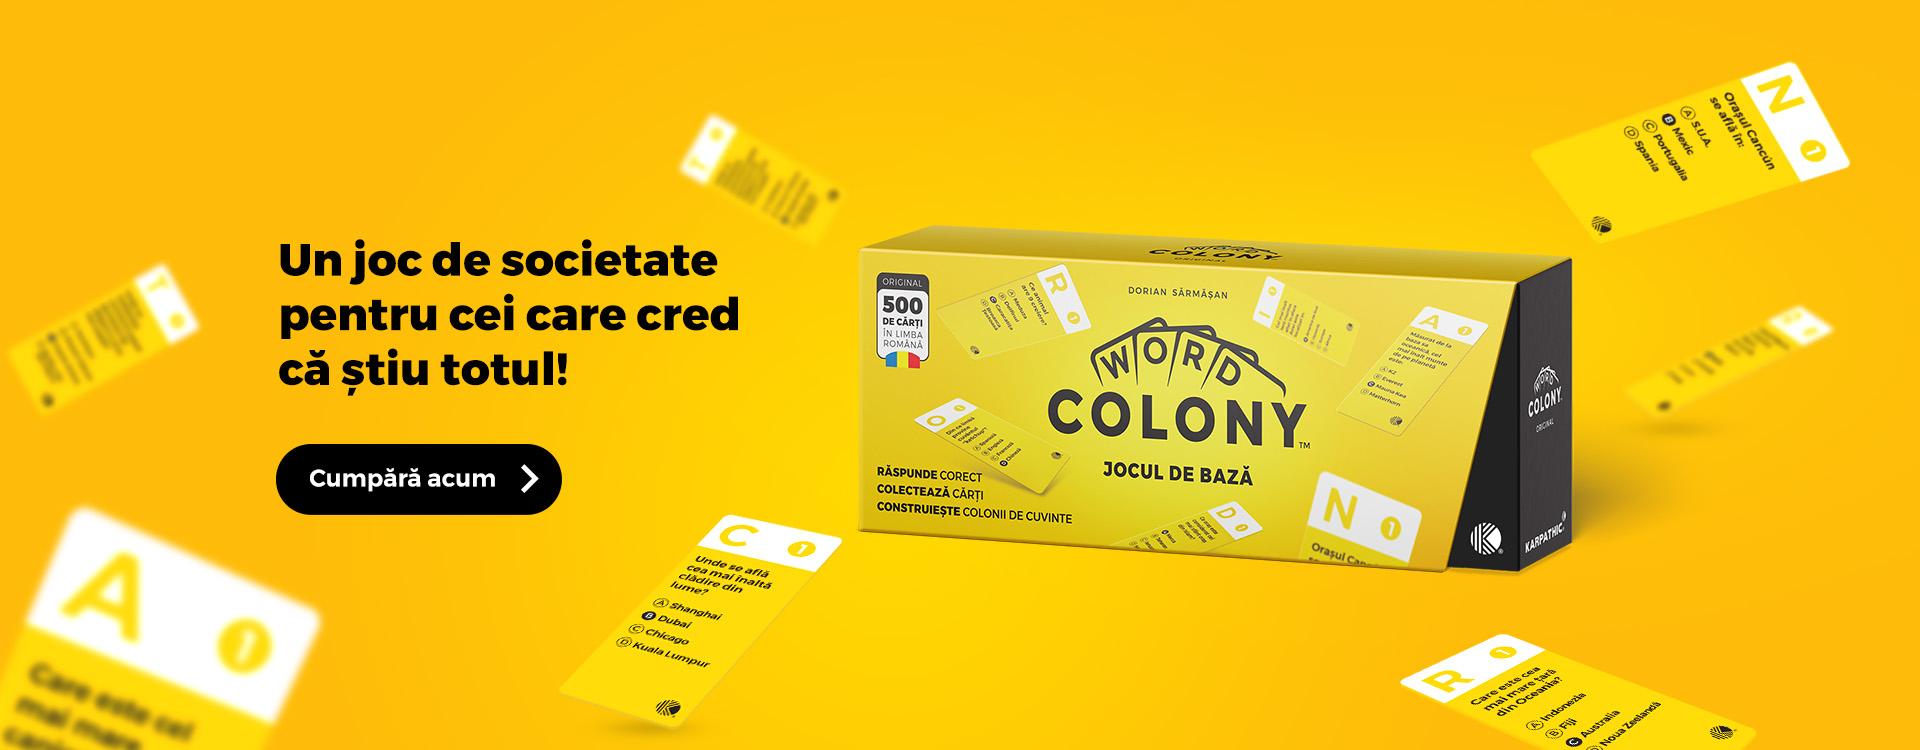 Word Colony Jocul de Baza